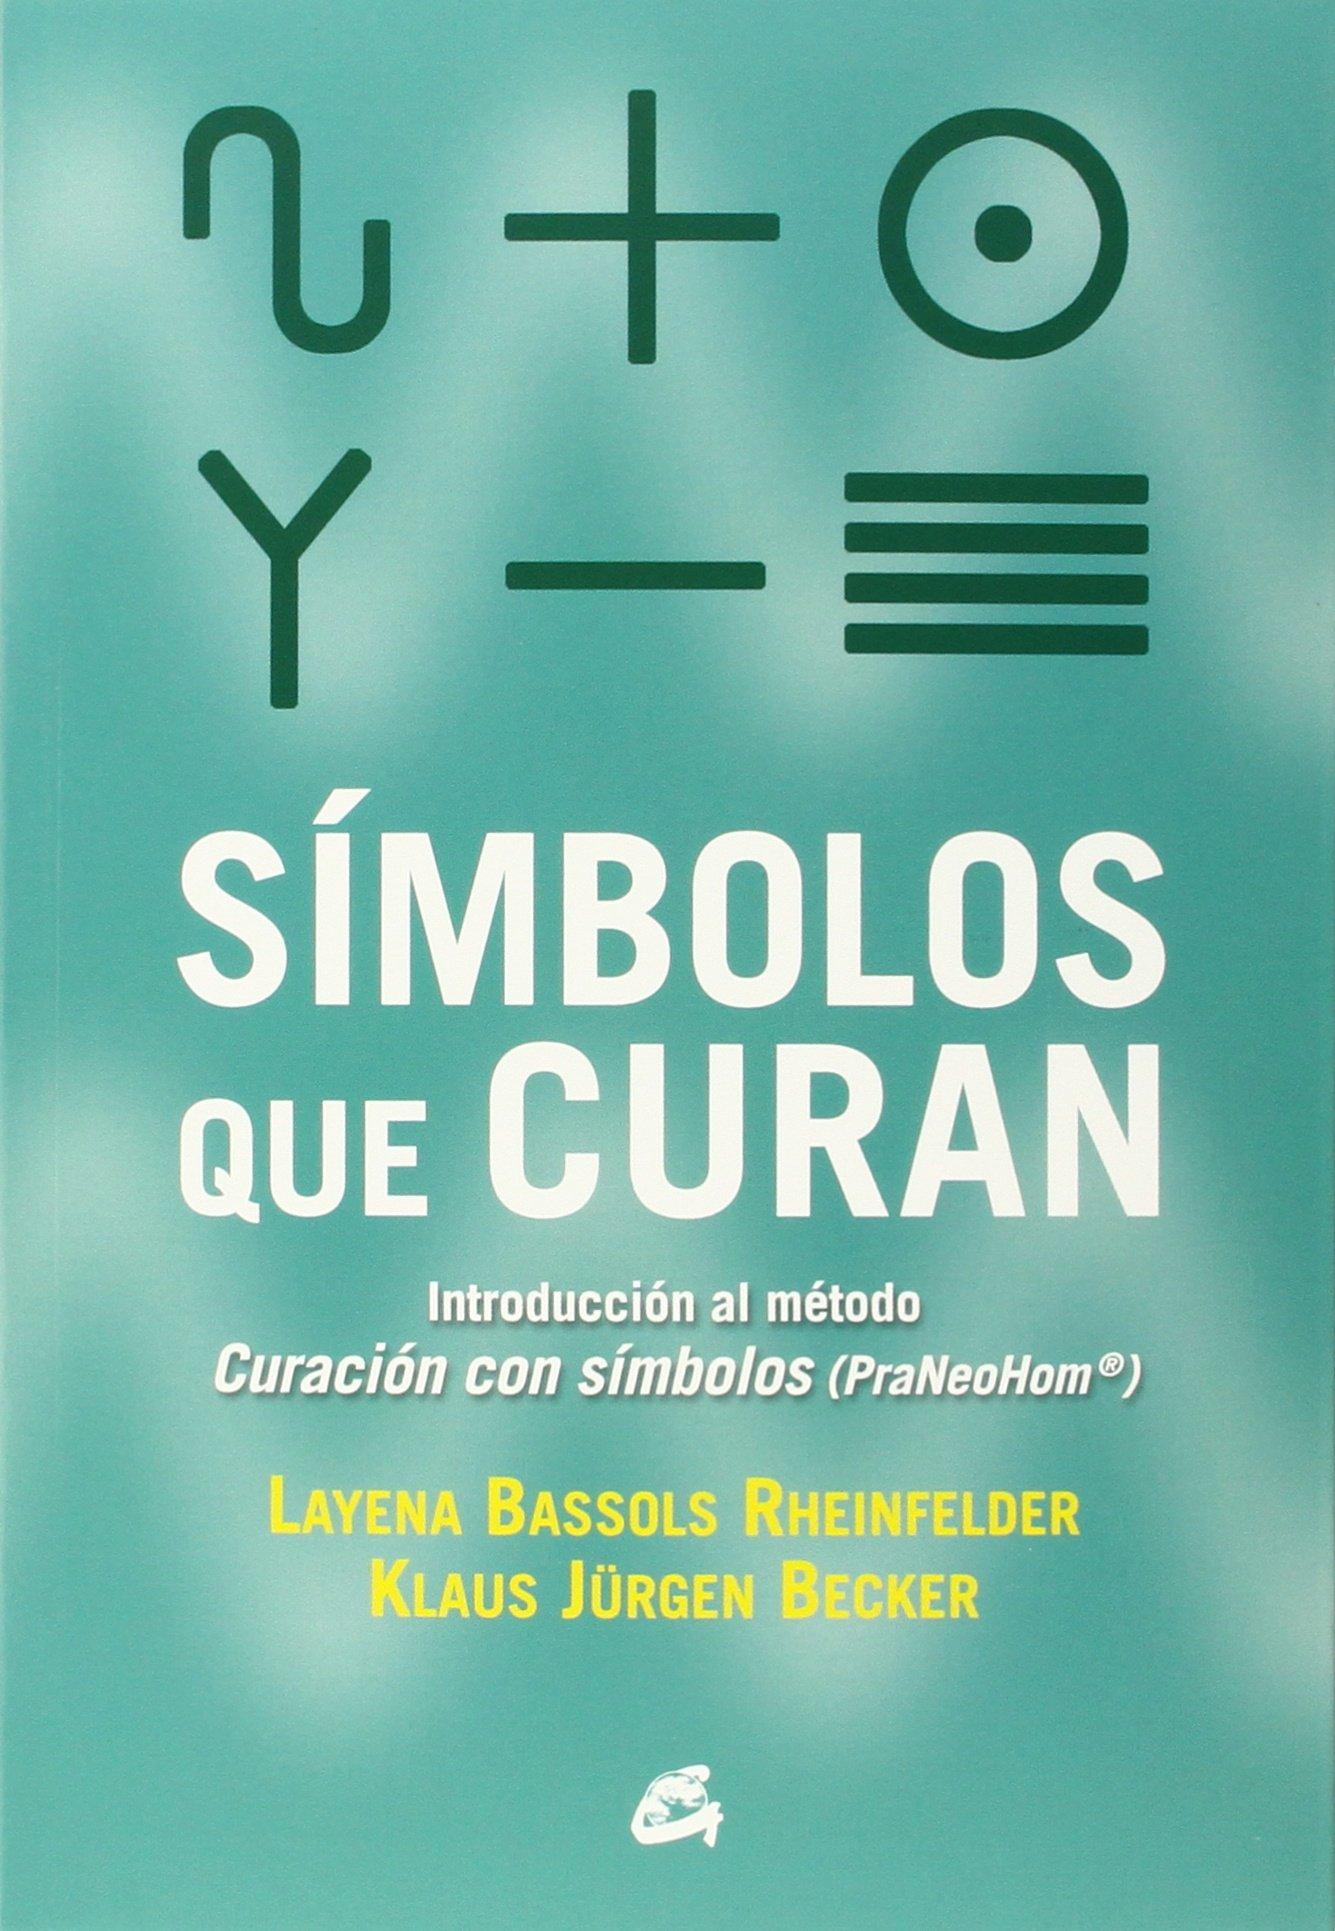 SIMBOLOS QUE CURAN (Salud natural) Tapa blanda – 1 may 2015 Gaia 8484455319 Complementary therapies healing & health